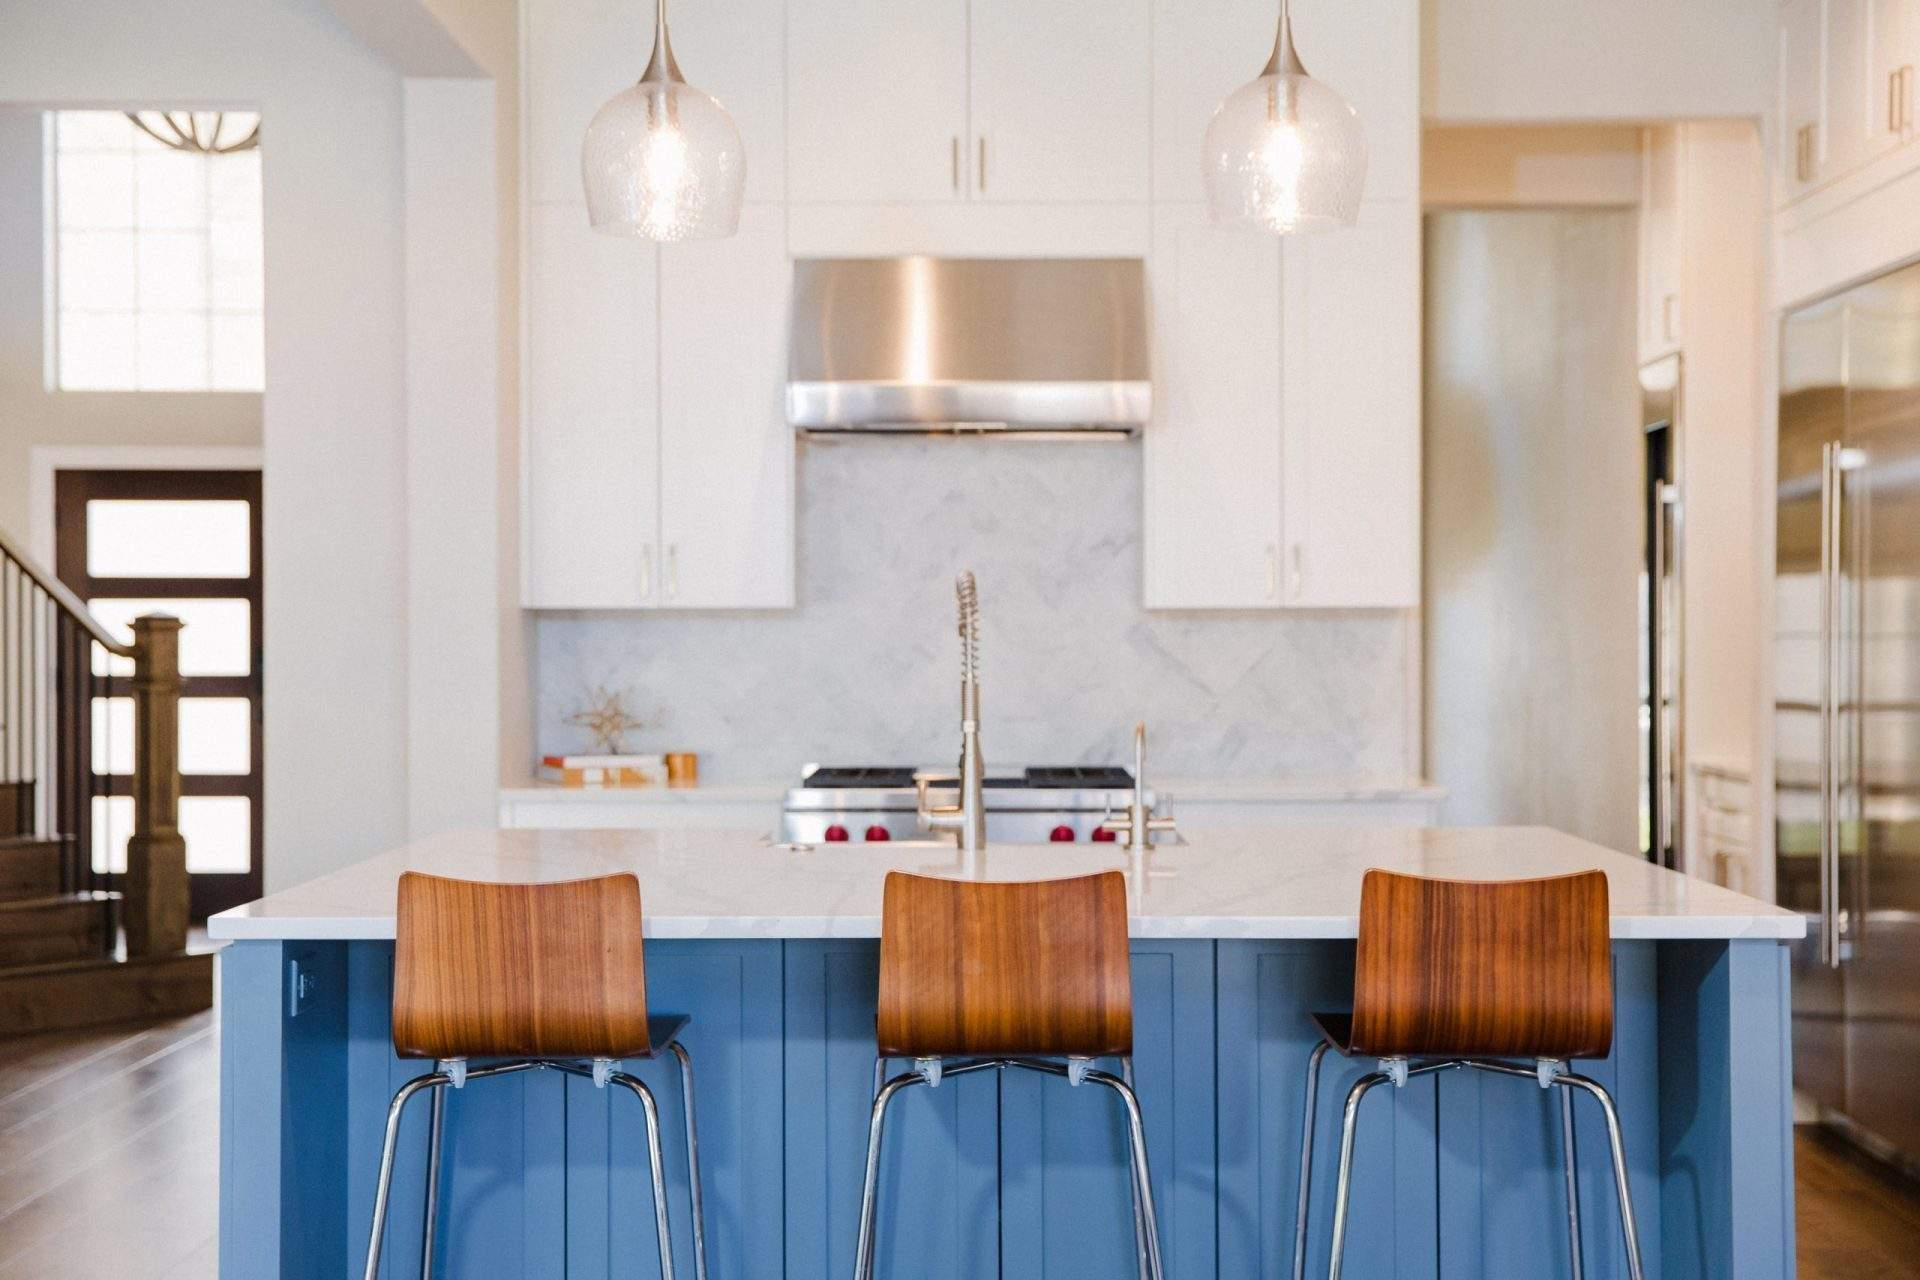 Northwest Balcones - interior design austin | kitchen with a white color palette and blue kitchen island - home in Northwest Balcones | austin, texas